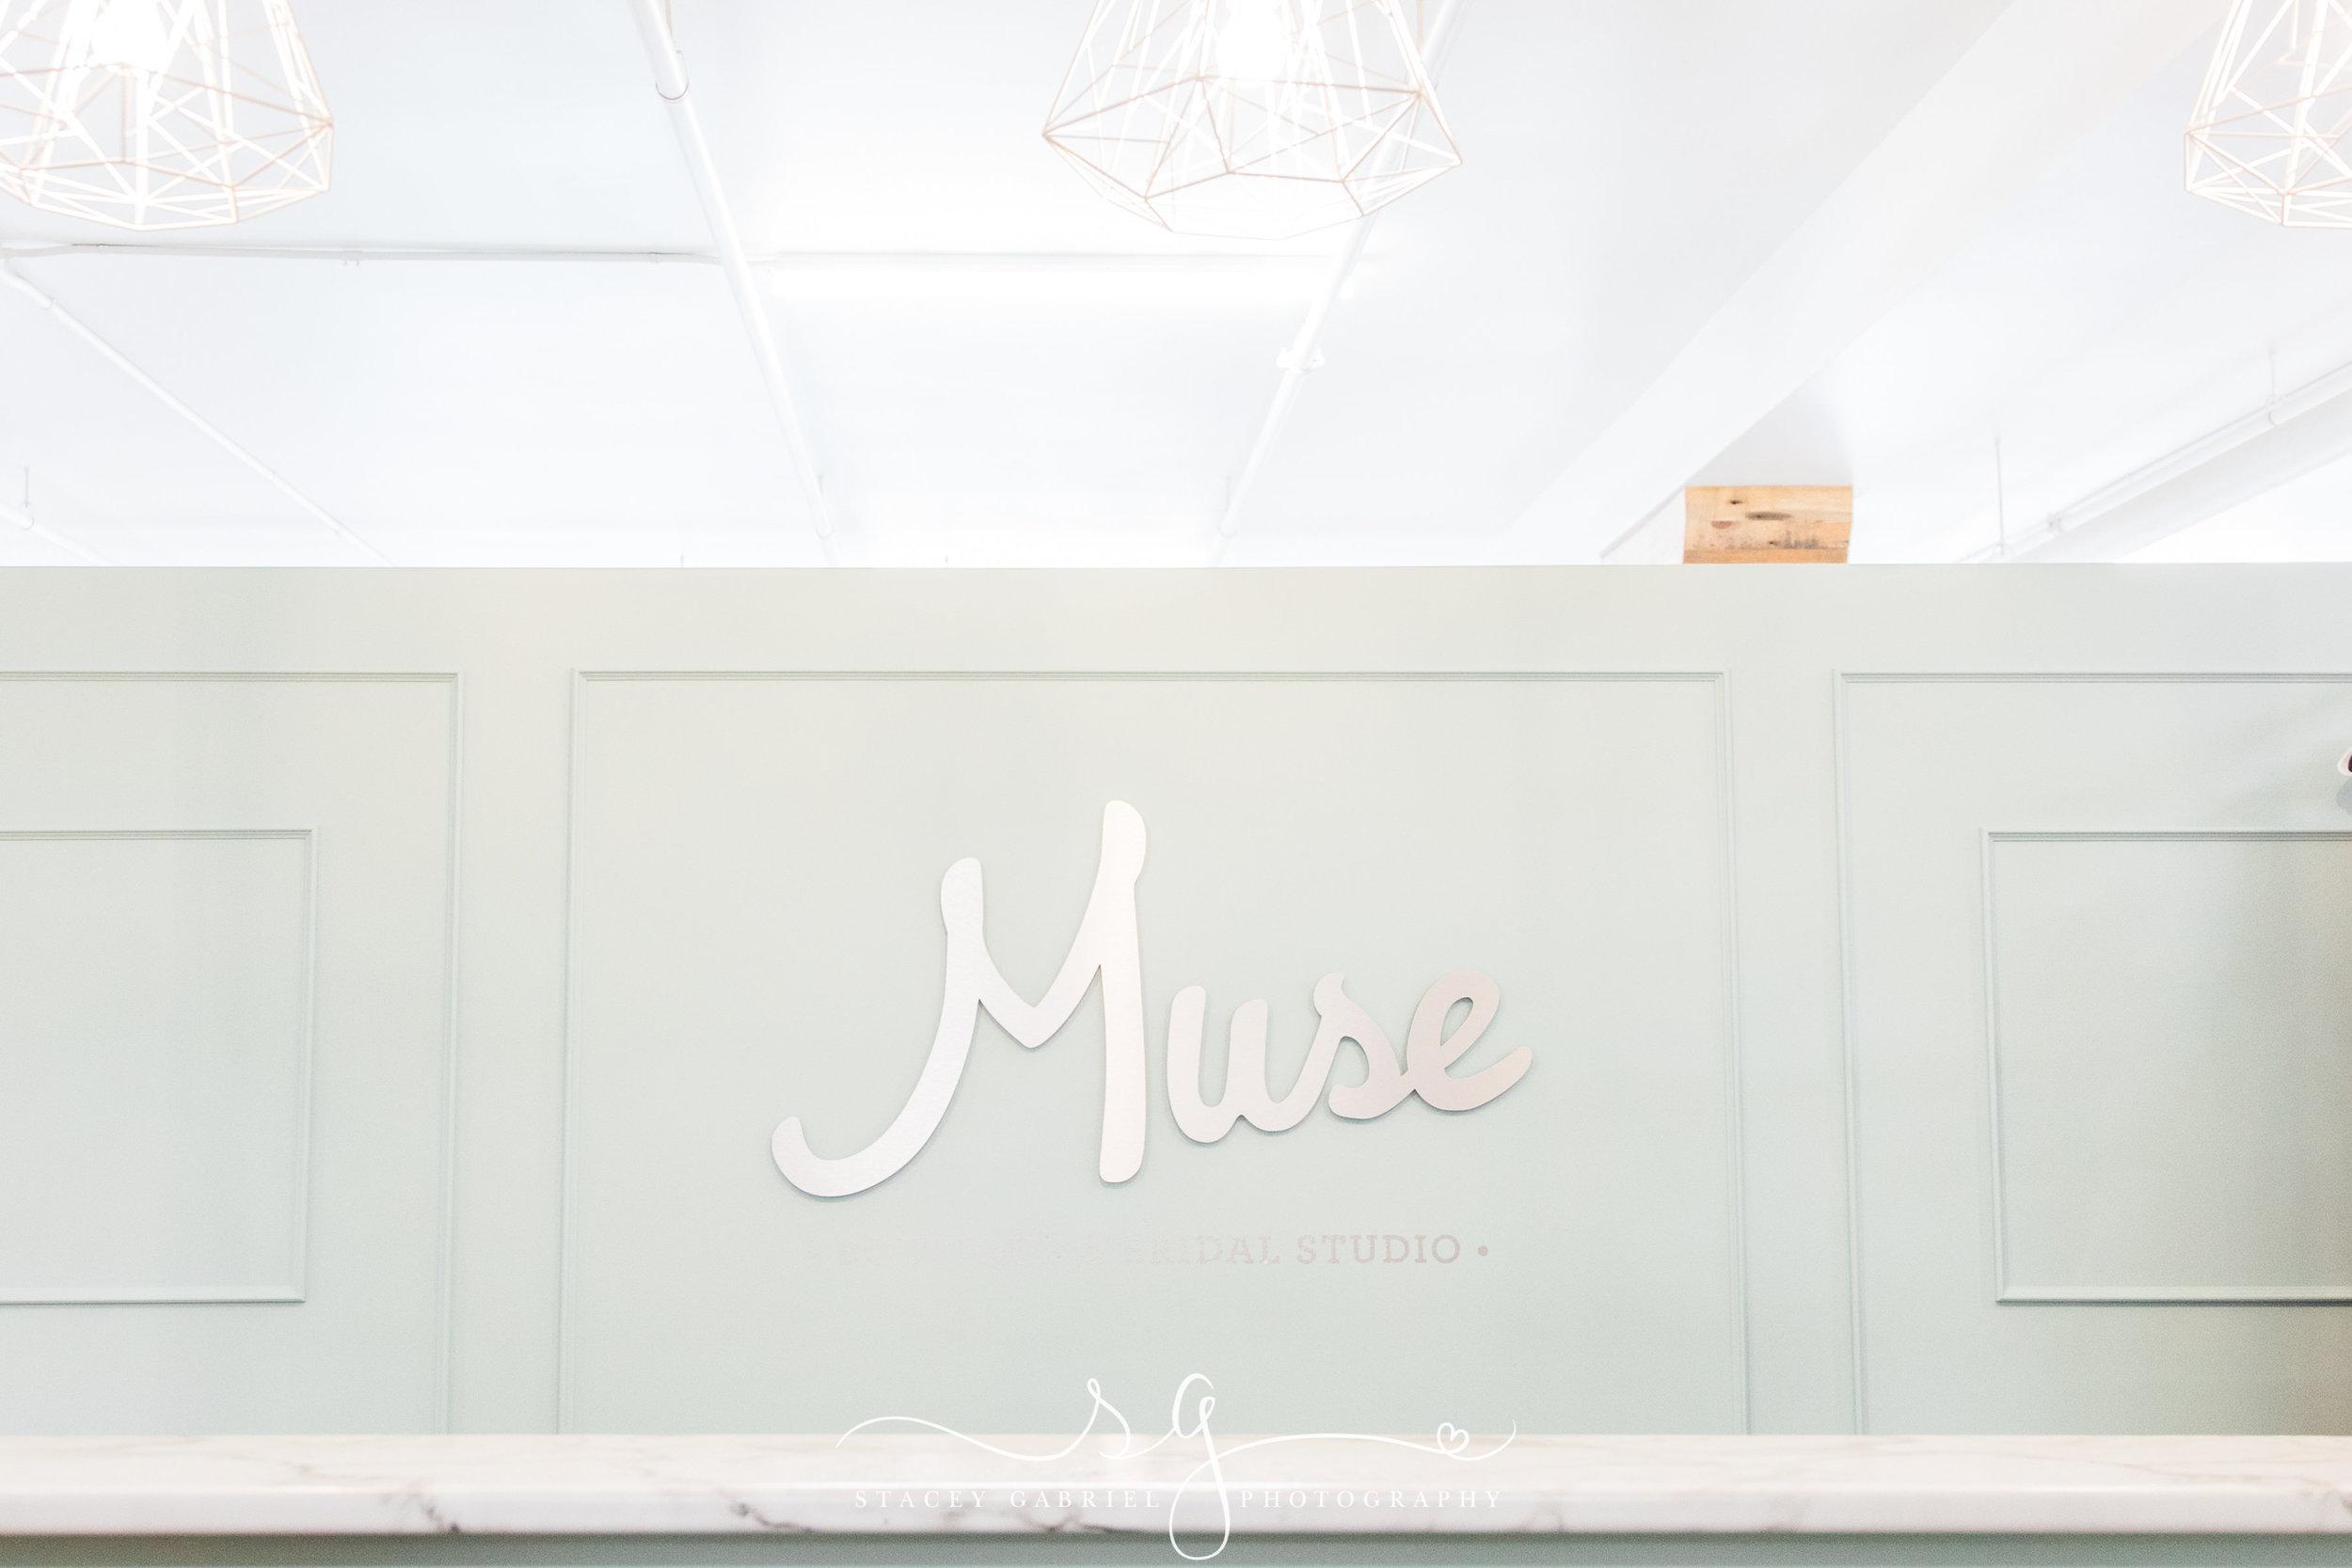 Muse Logo-done1-0061.jpg